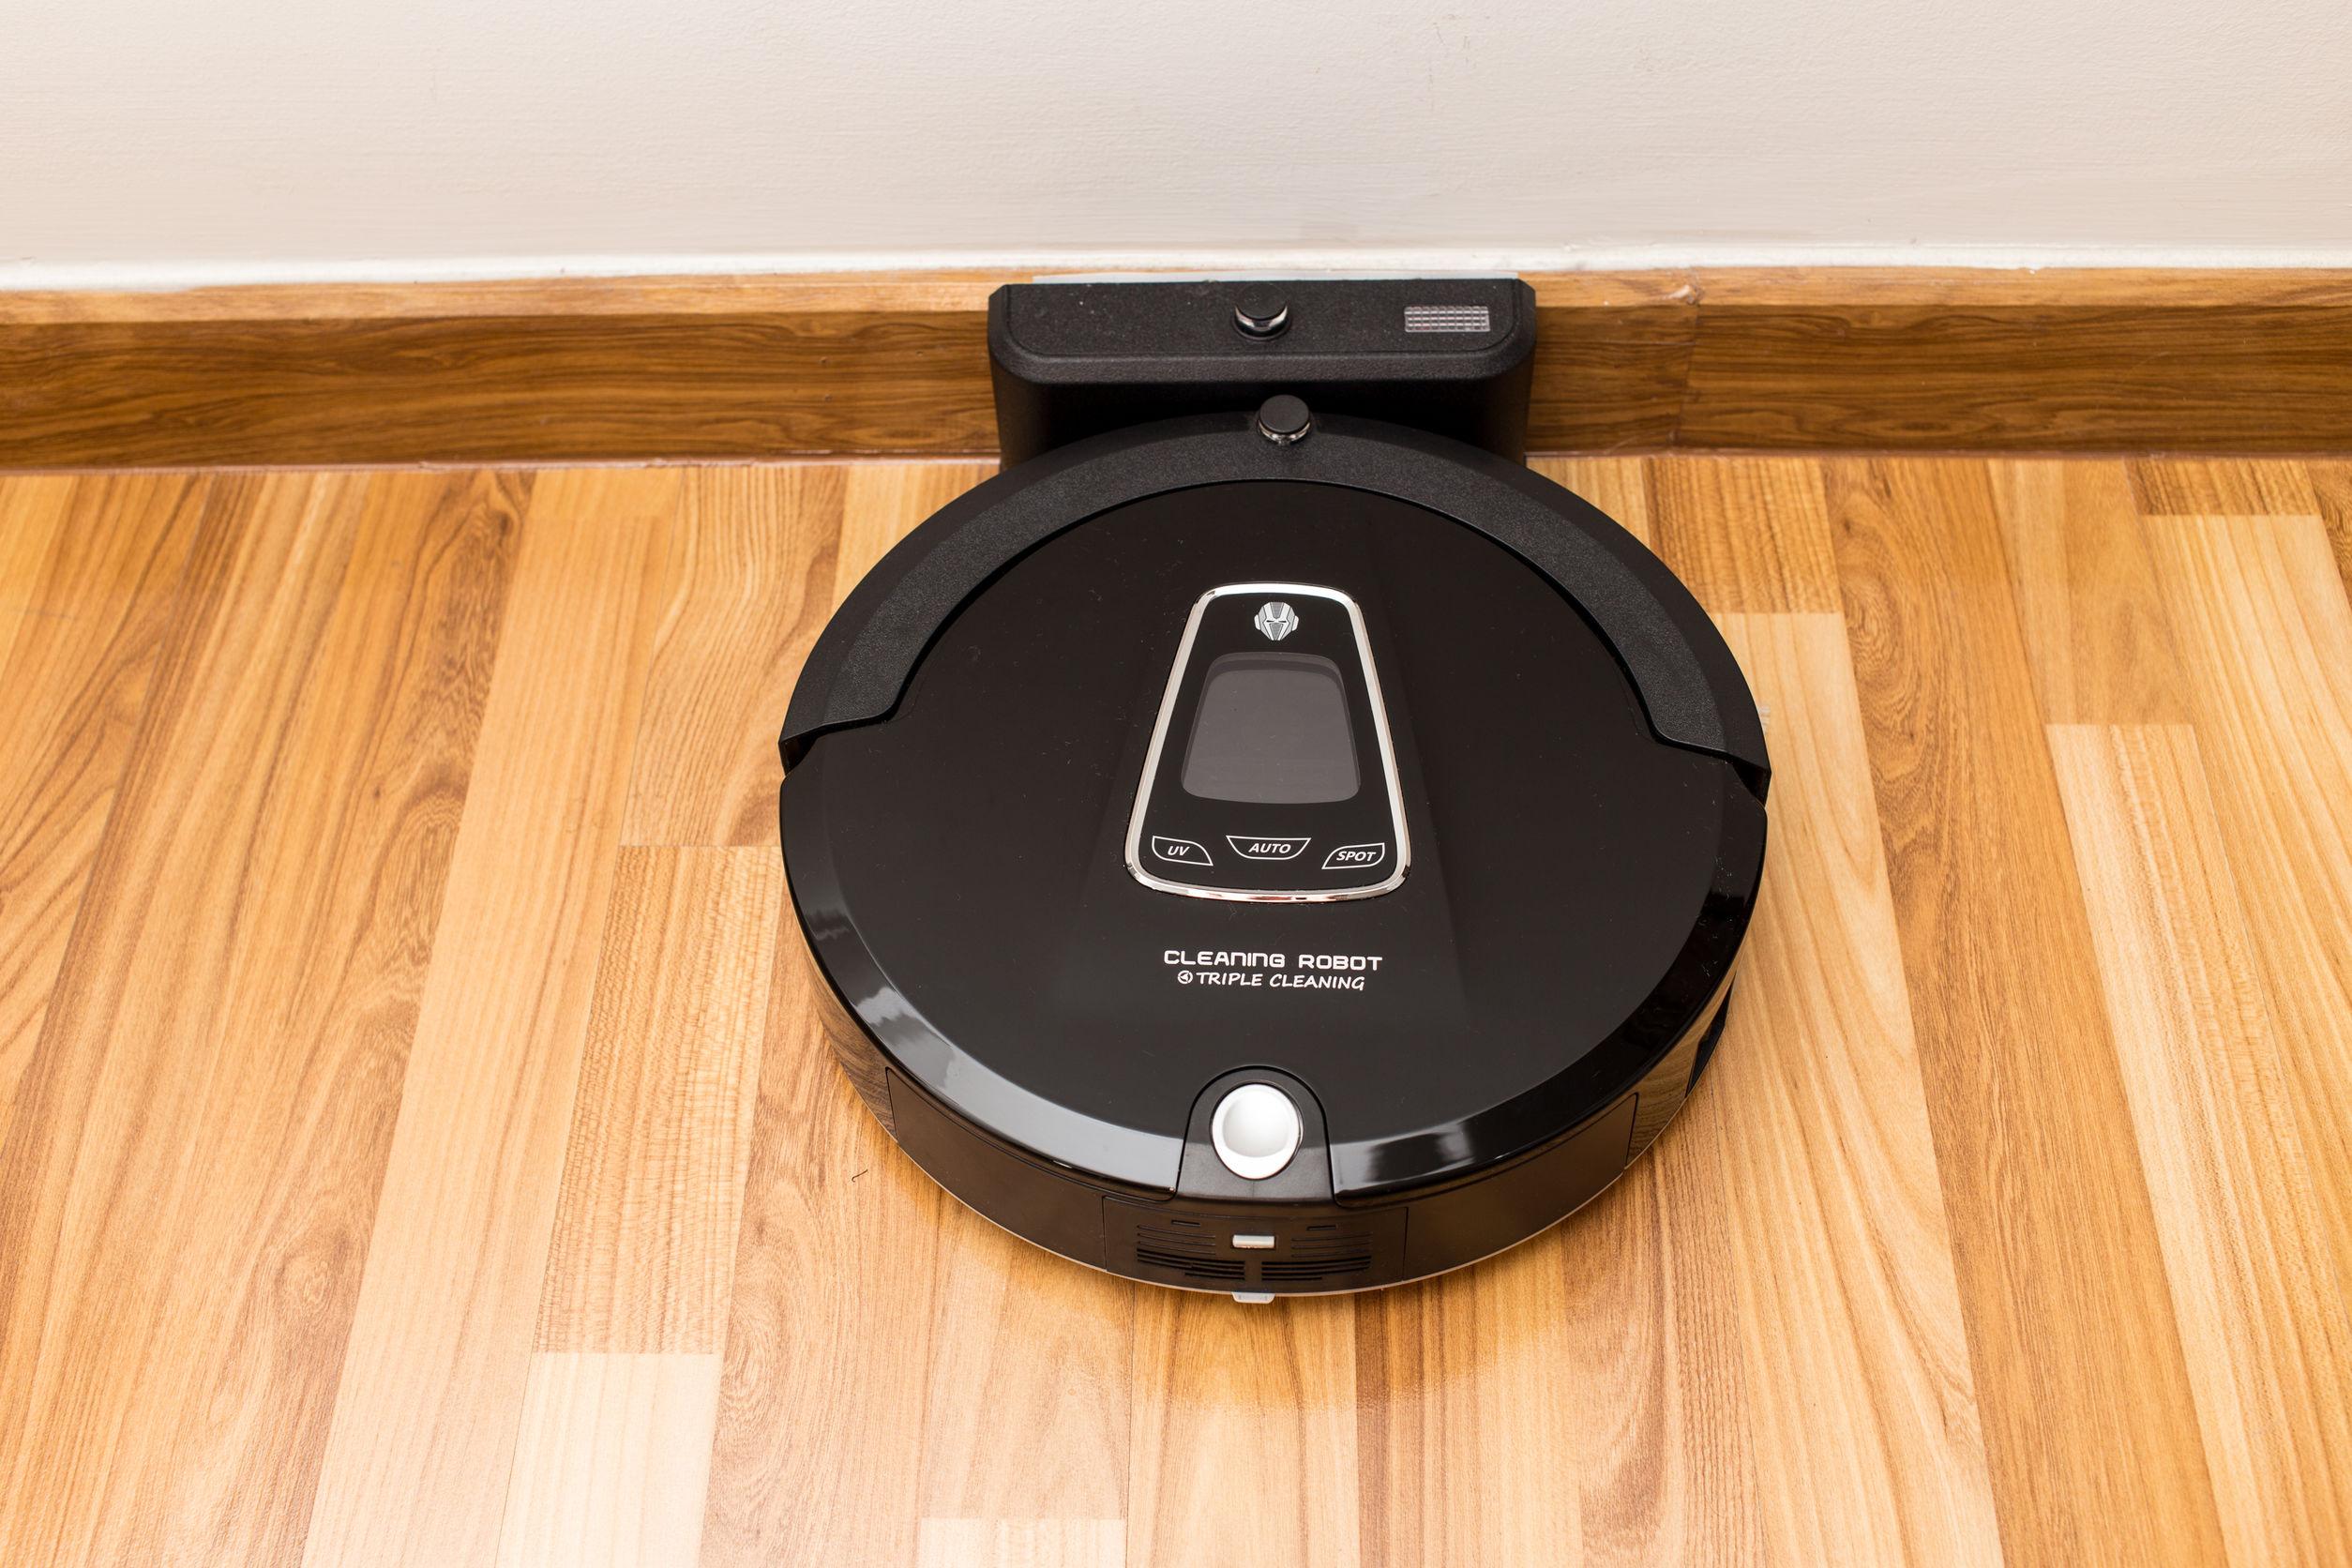 Aspirador robótico en piso de parquet de madera, aspiradora inteligente